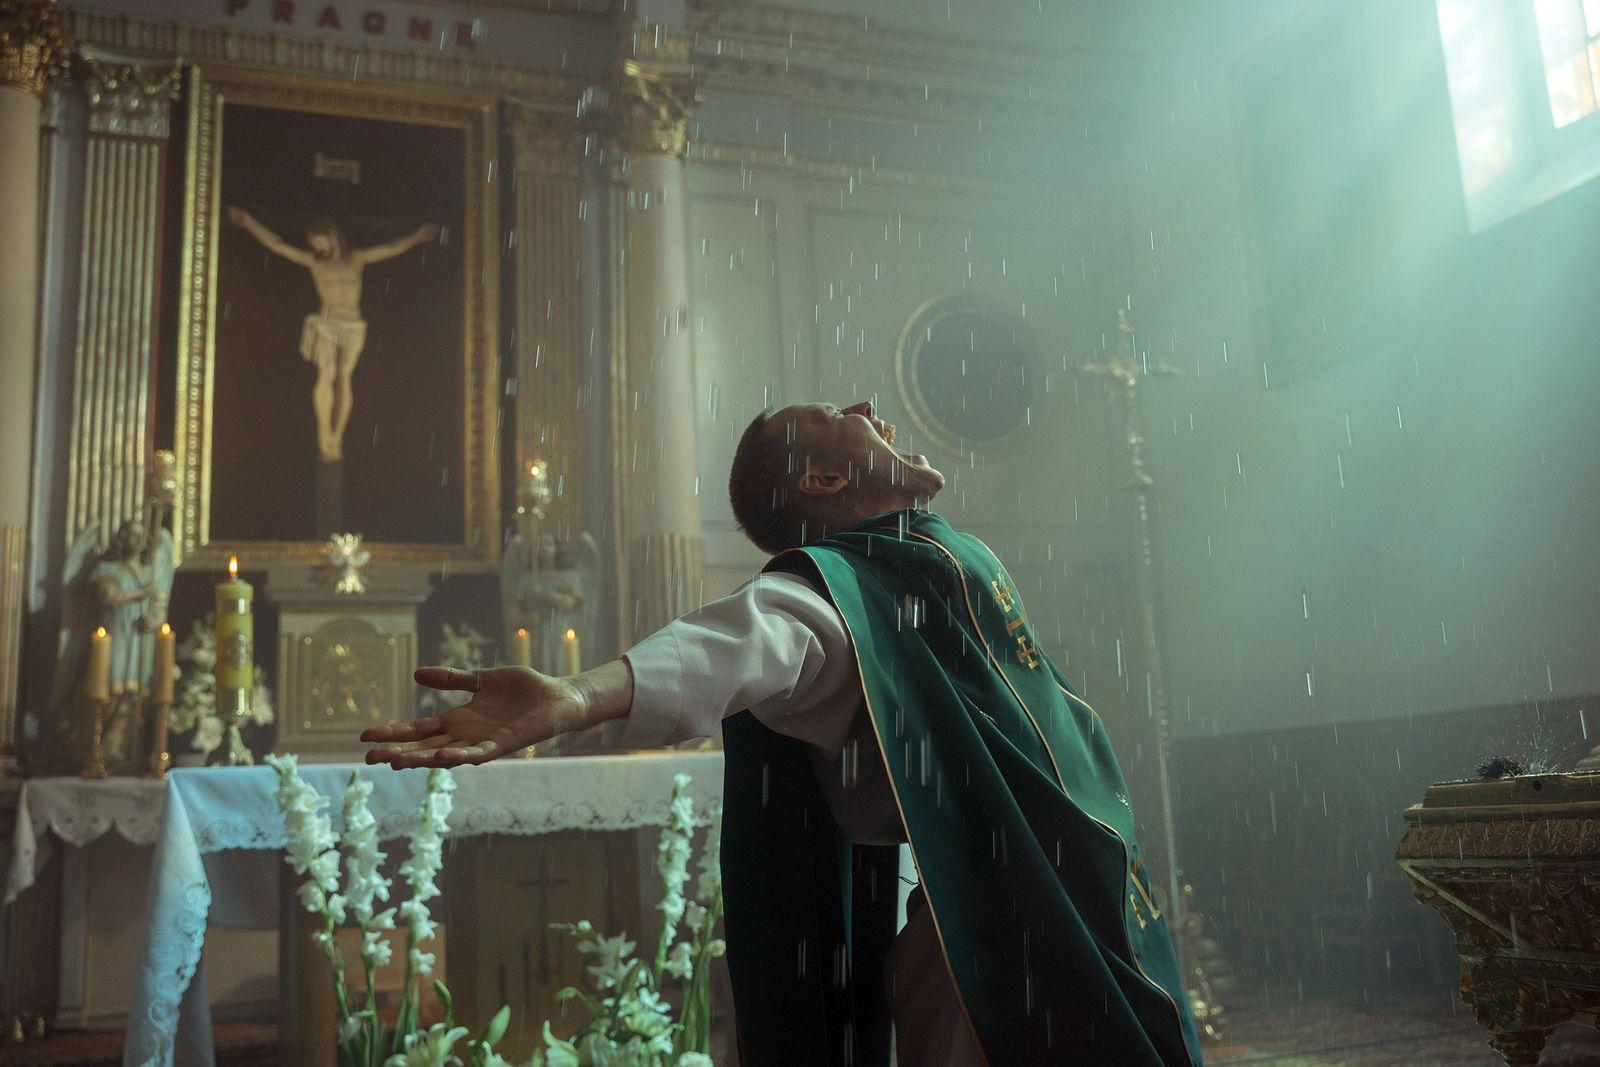 Film/ Corpus Christi